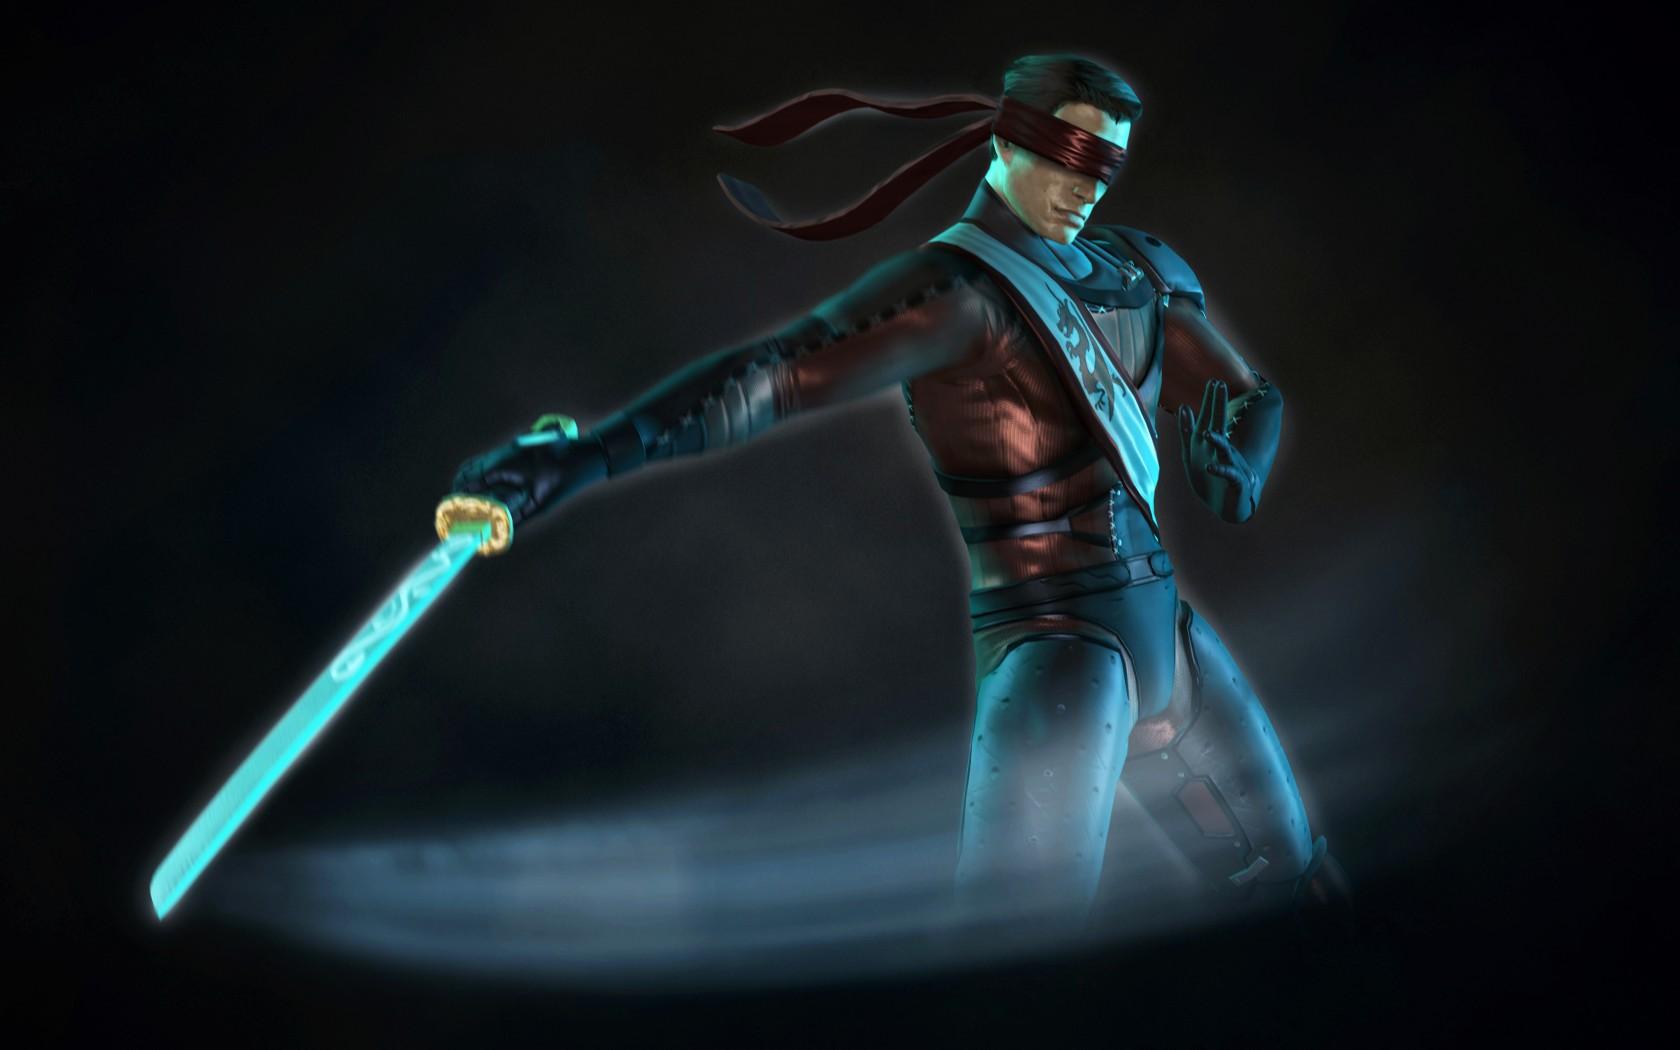 Mortal Kombat Wallpaper Kenshi Mortal Kombat Games Fan Site